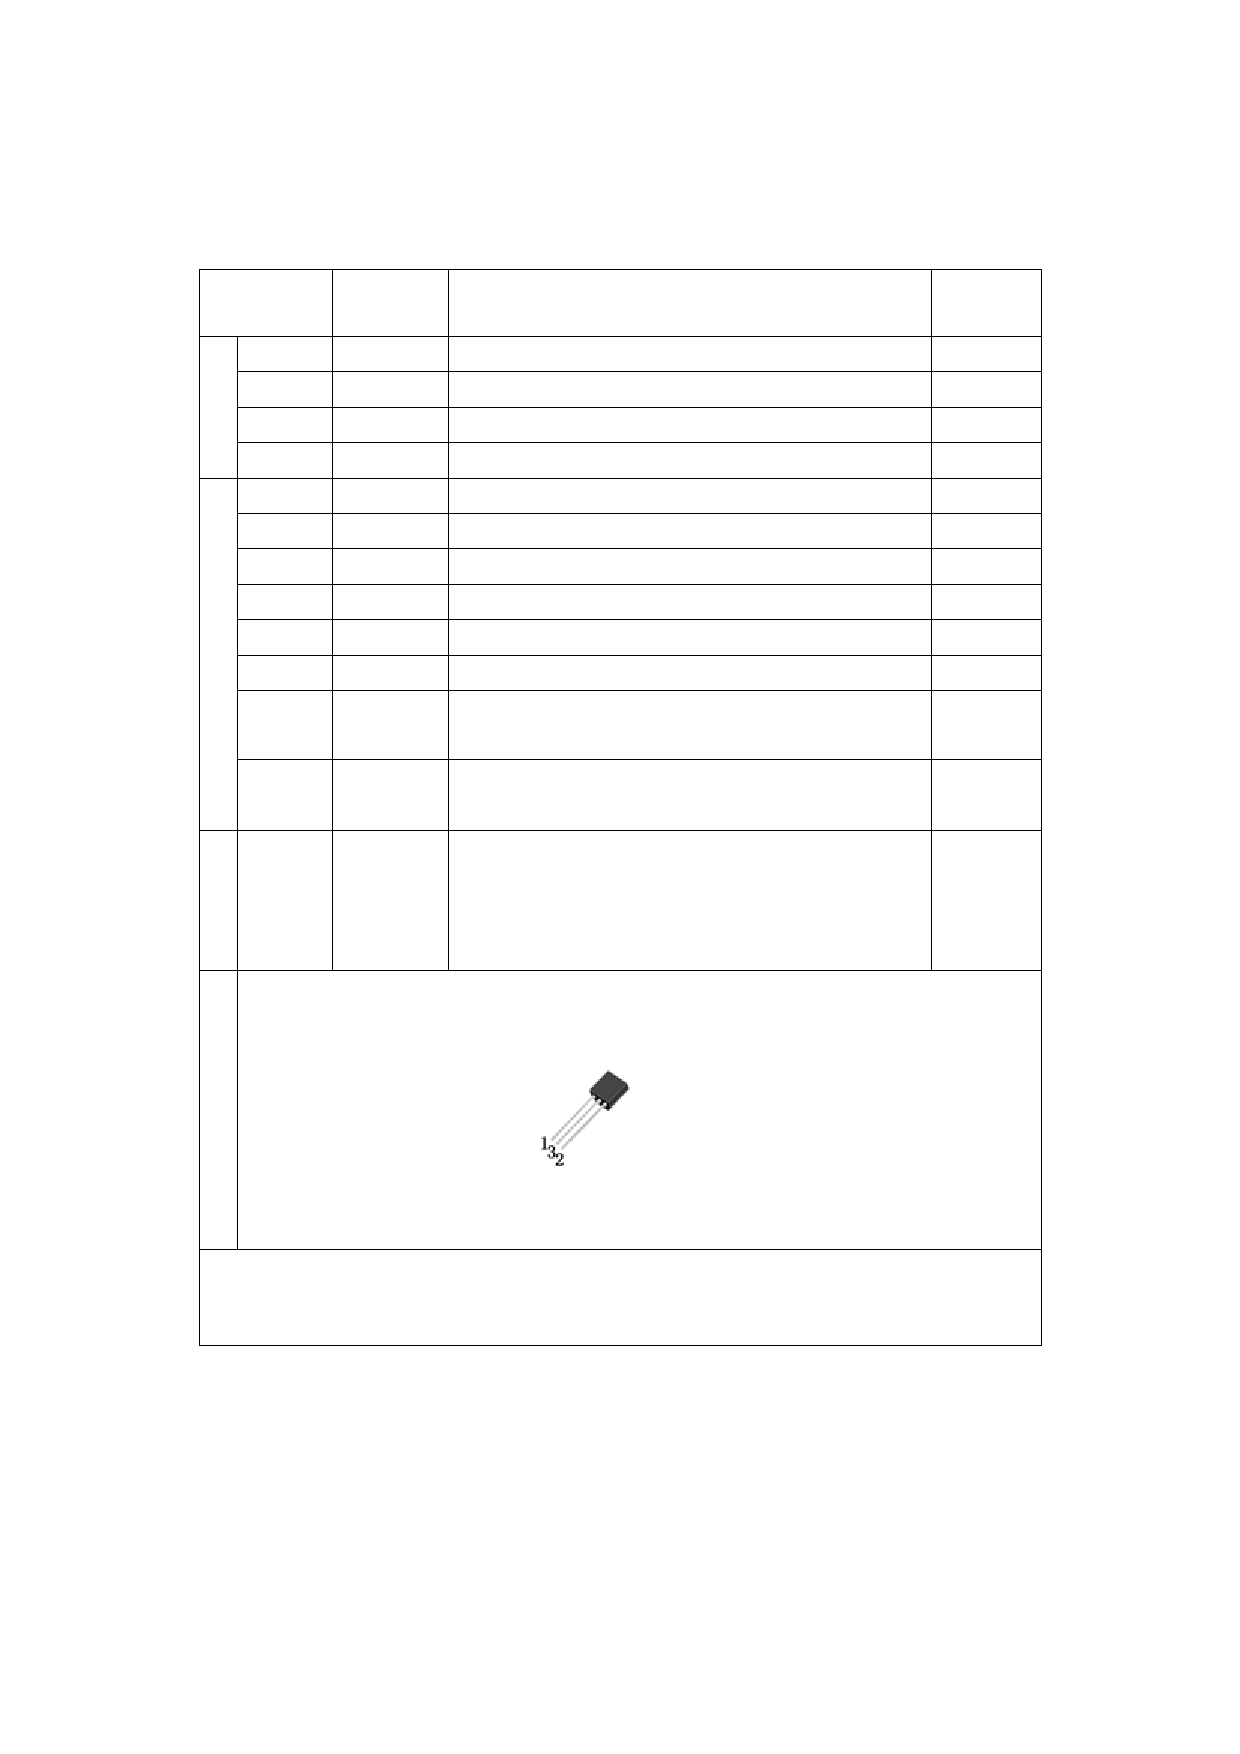 2SC3402 Datenblatt PDF